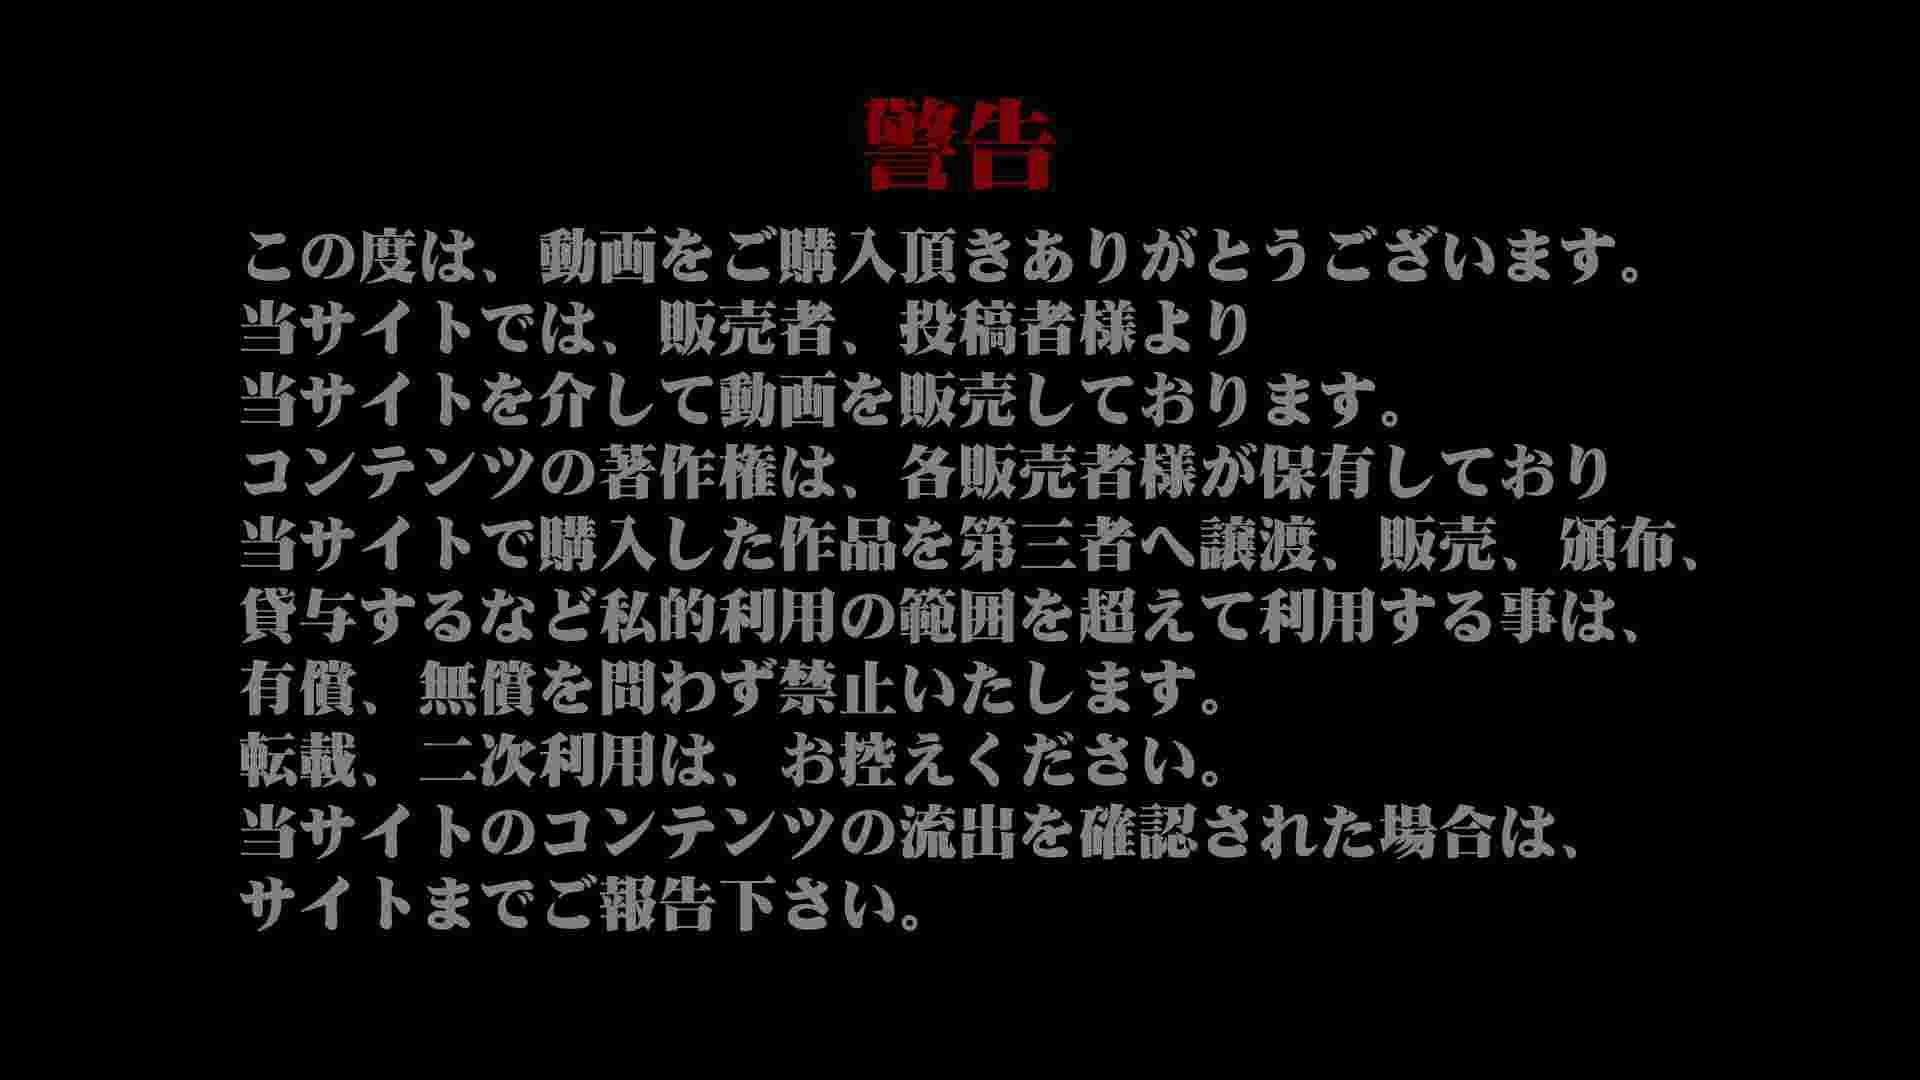 Aquaな露天風呂Vol.981 盗撮 エロ無料画像 50枚 2